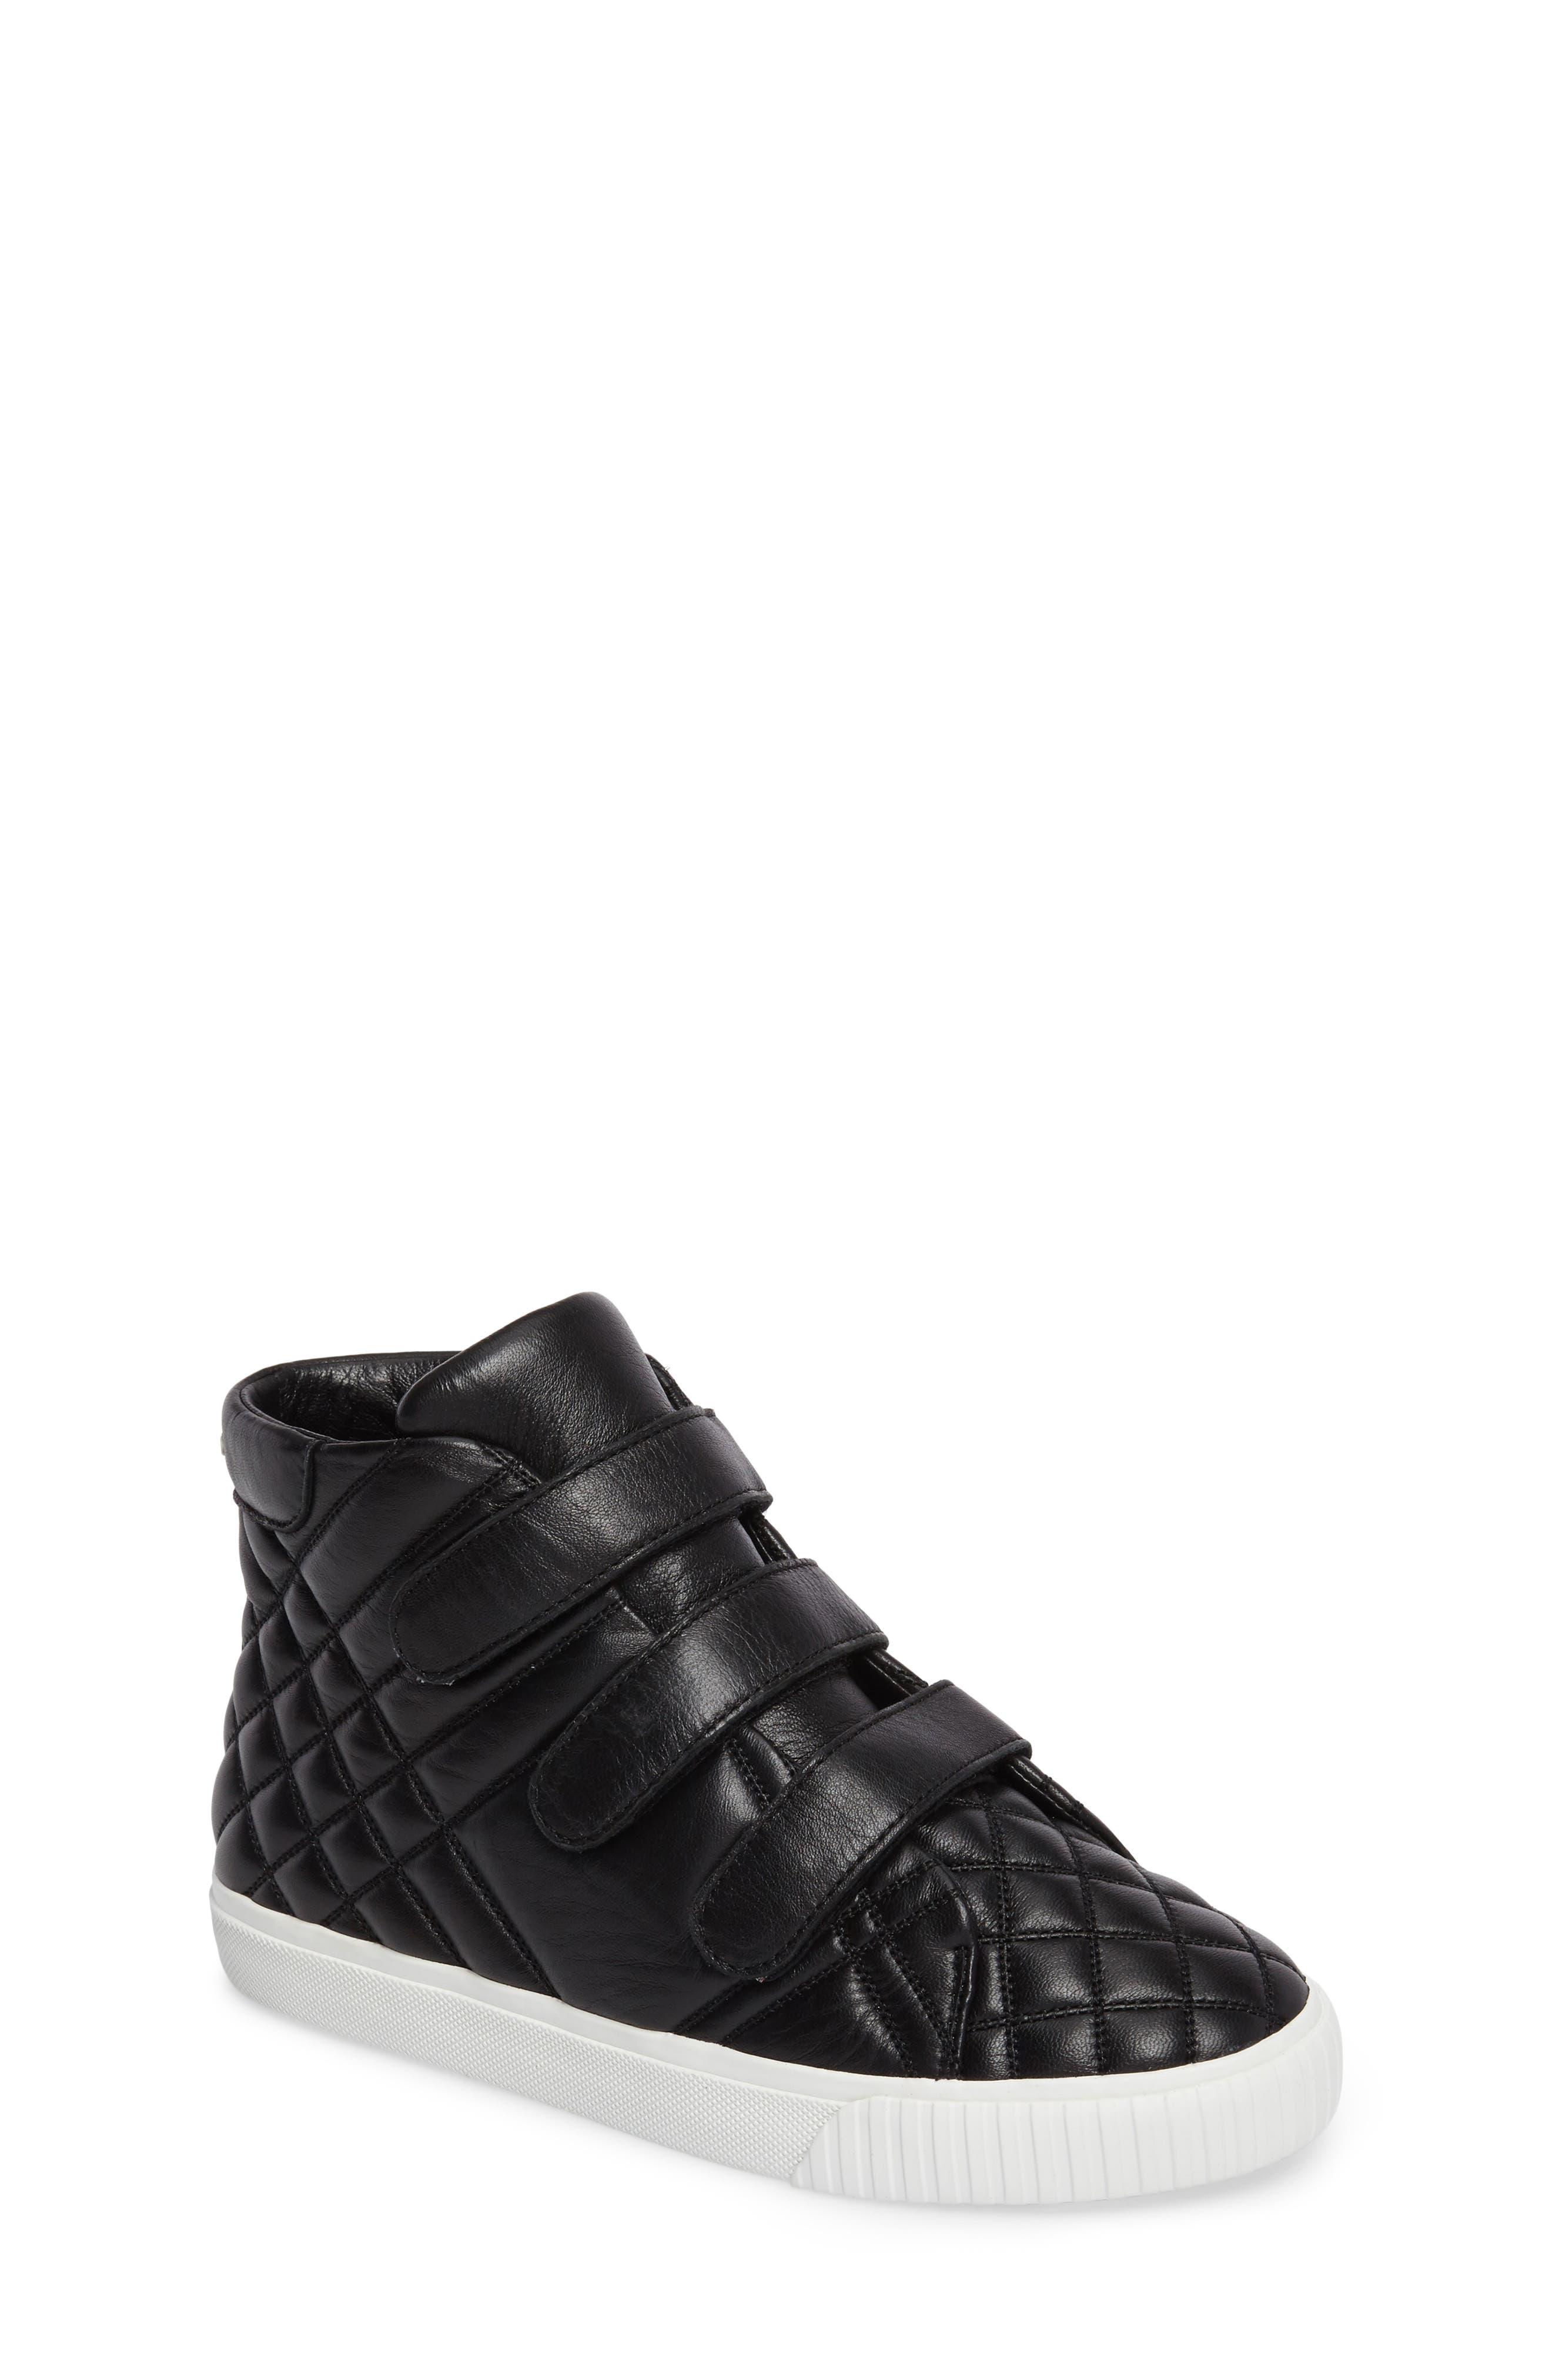 Main Image - Burberry Sturrock Quilted High Top Sneaker (Walker, Toddler, Little Kid & Big Kid)